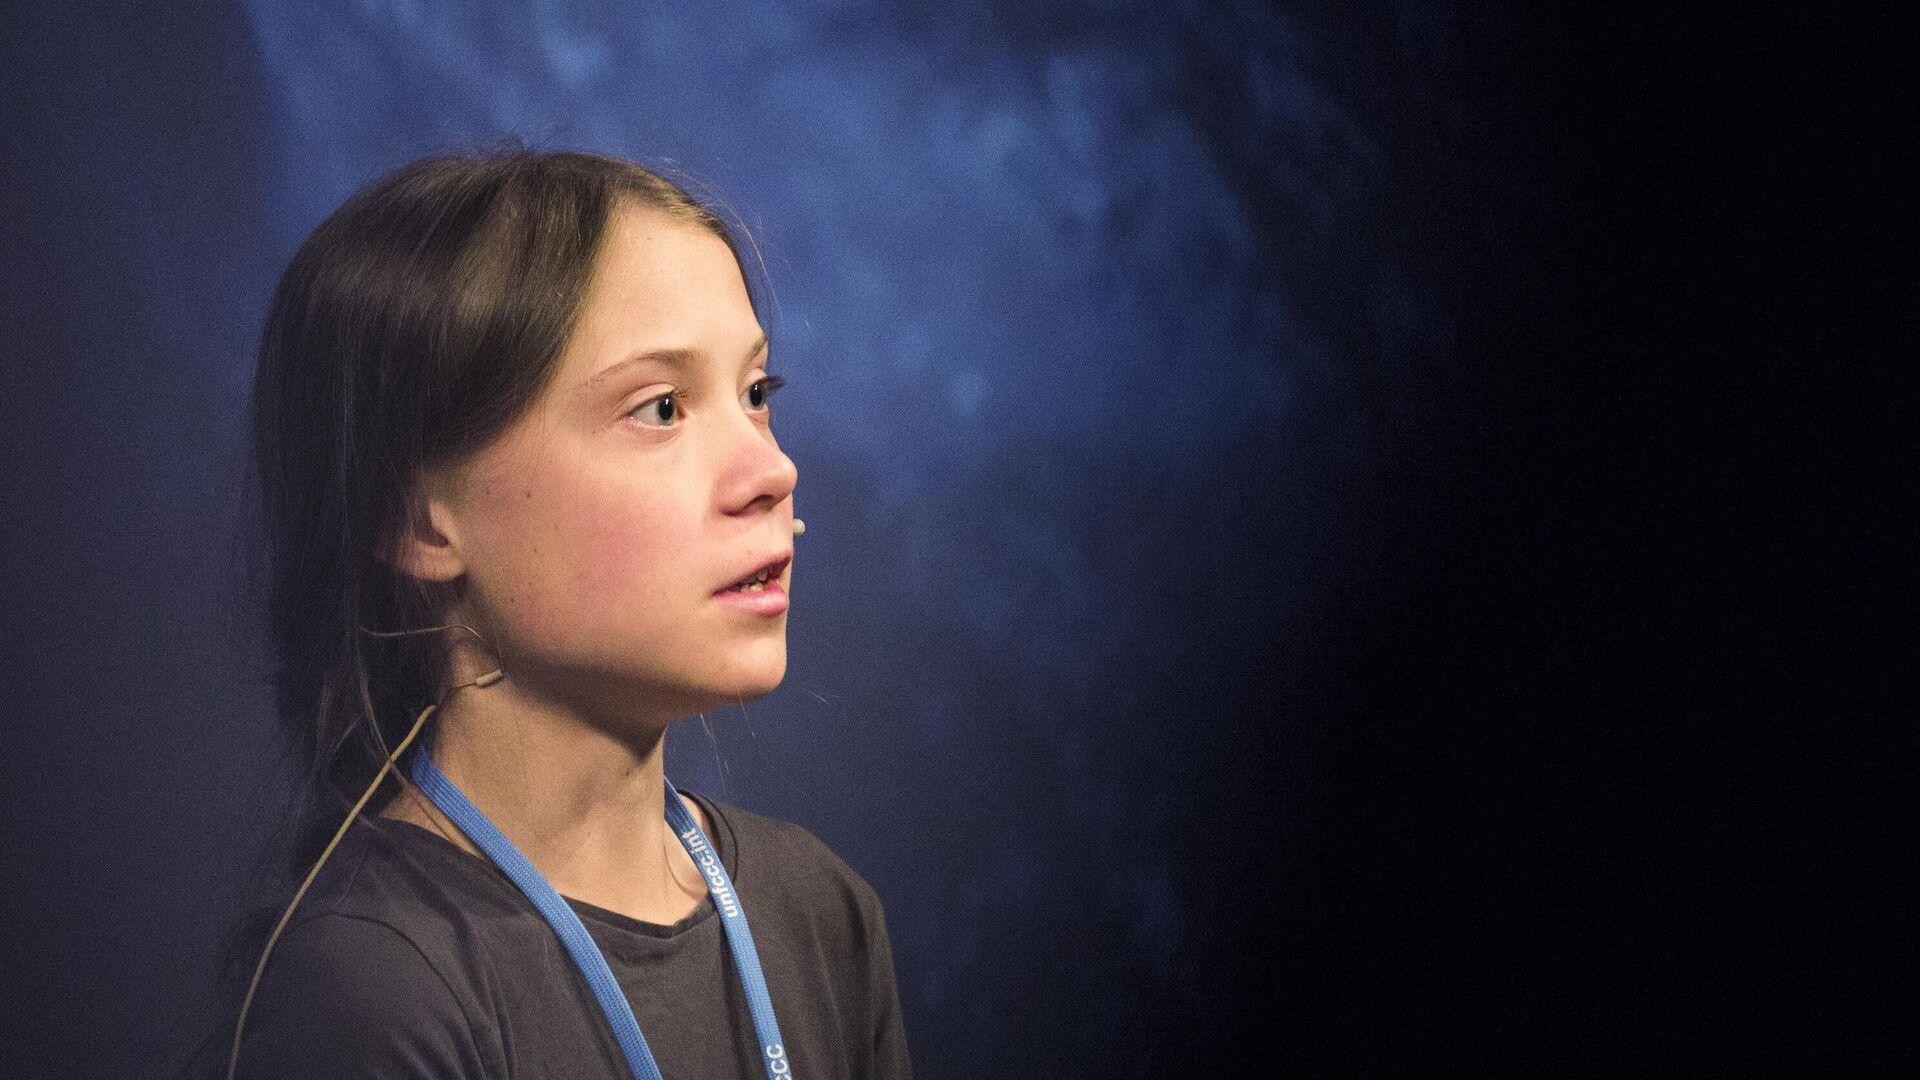 Greta Thunberg (Archivfoto) - SNA, 1920, 17.09.2021